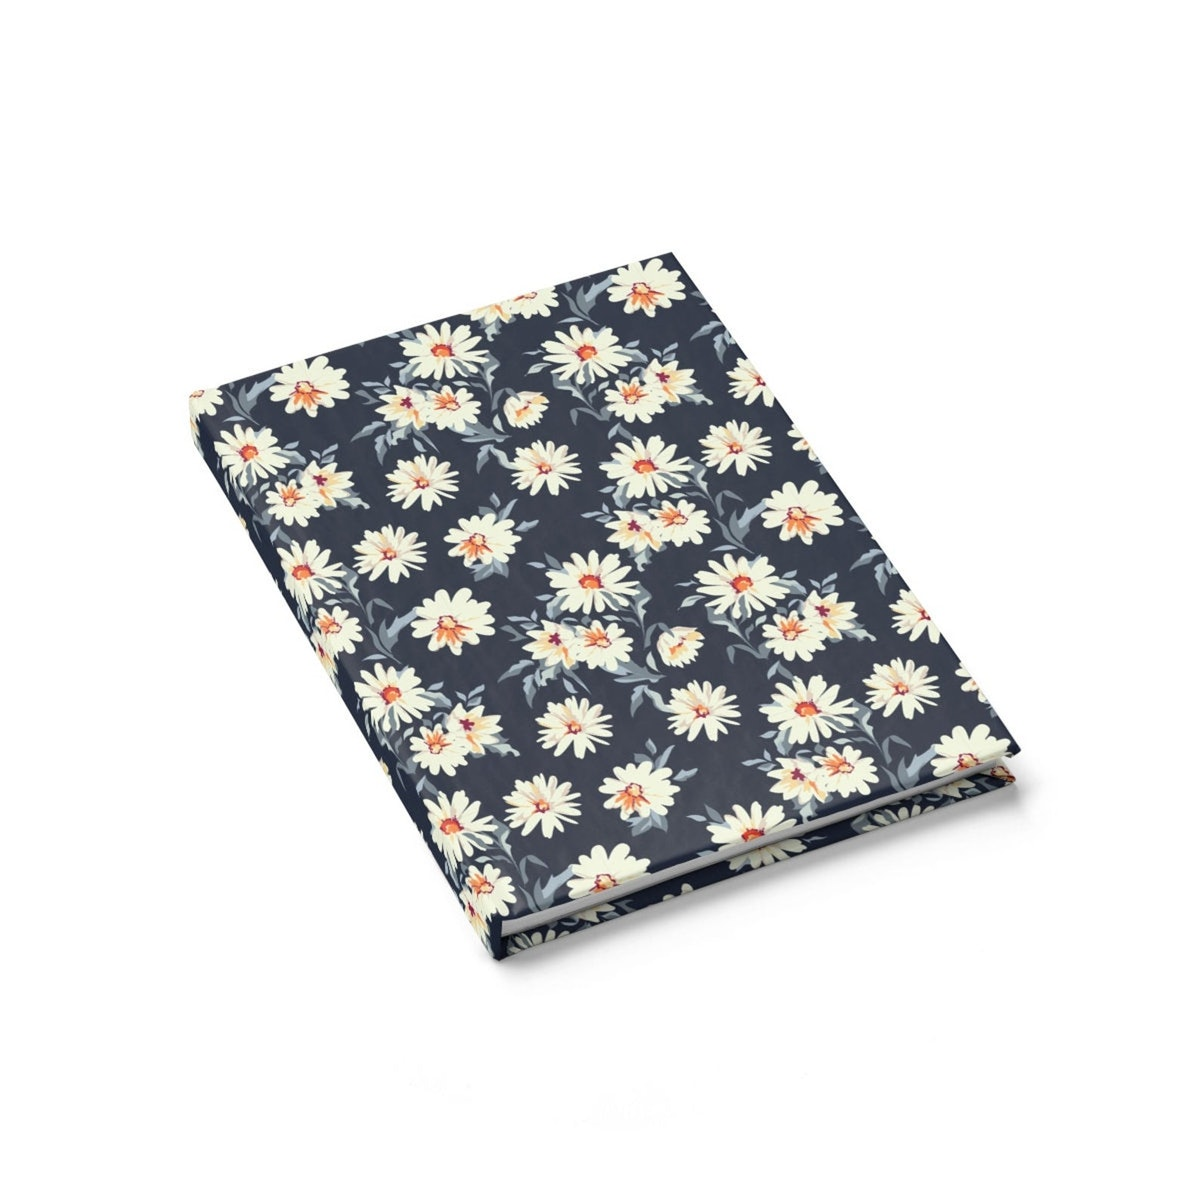 Floral Daisies Flower Journal Notebook